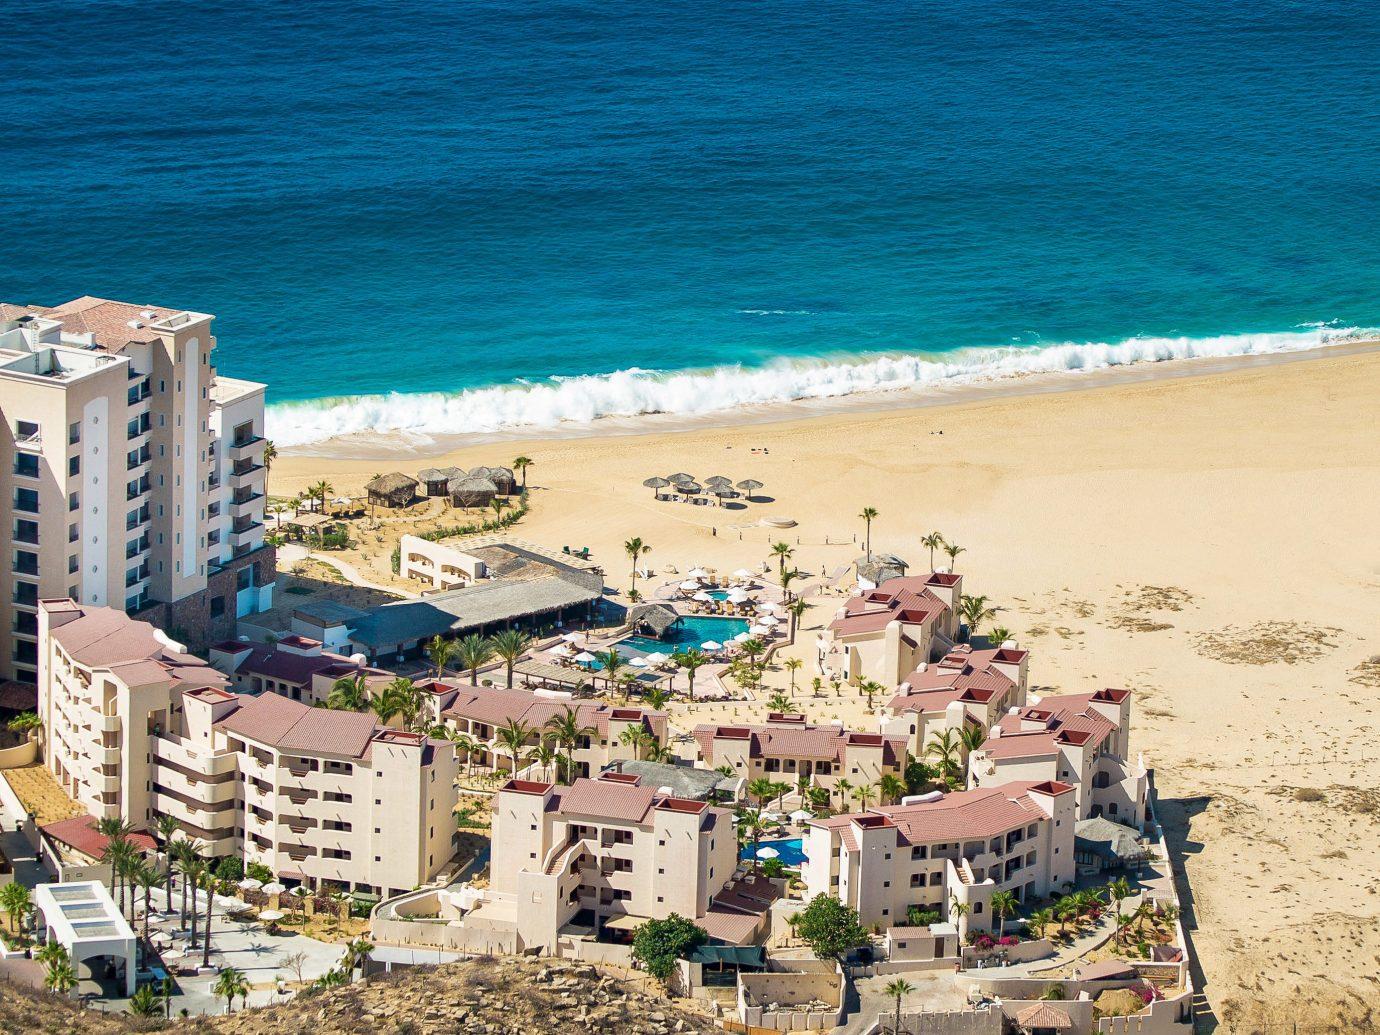 Budget Hotels water outdoor umbrella Beach Coast Sea vacation shore Ocean cape bay aerial photography